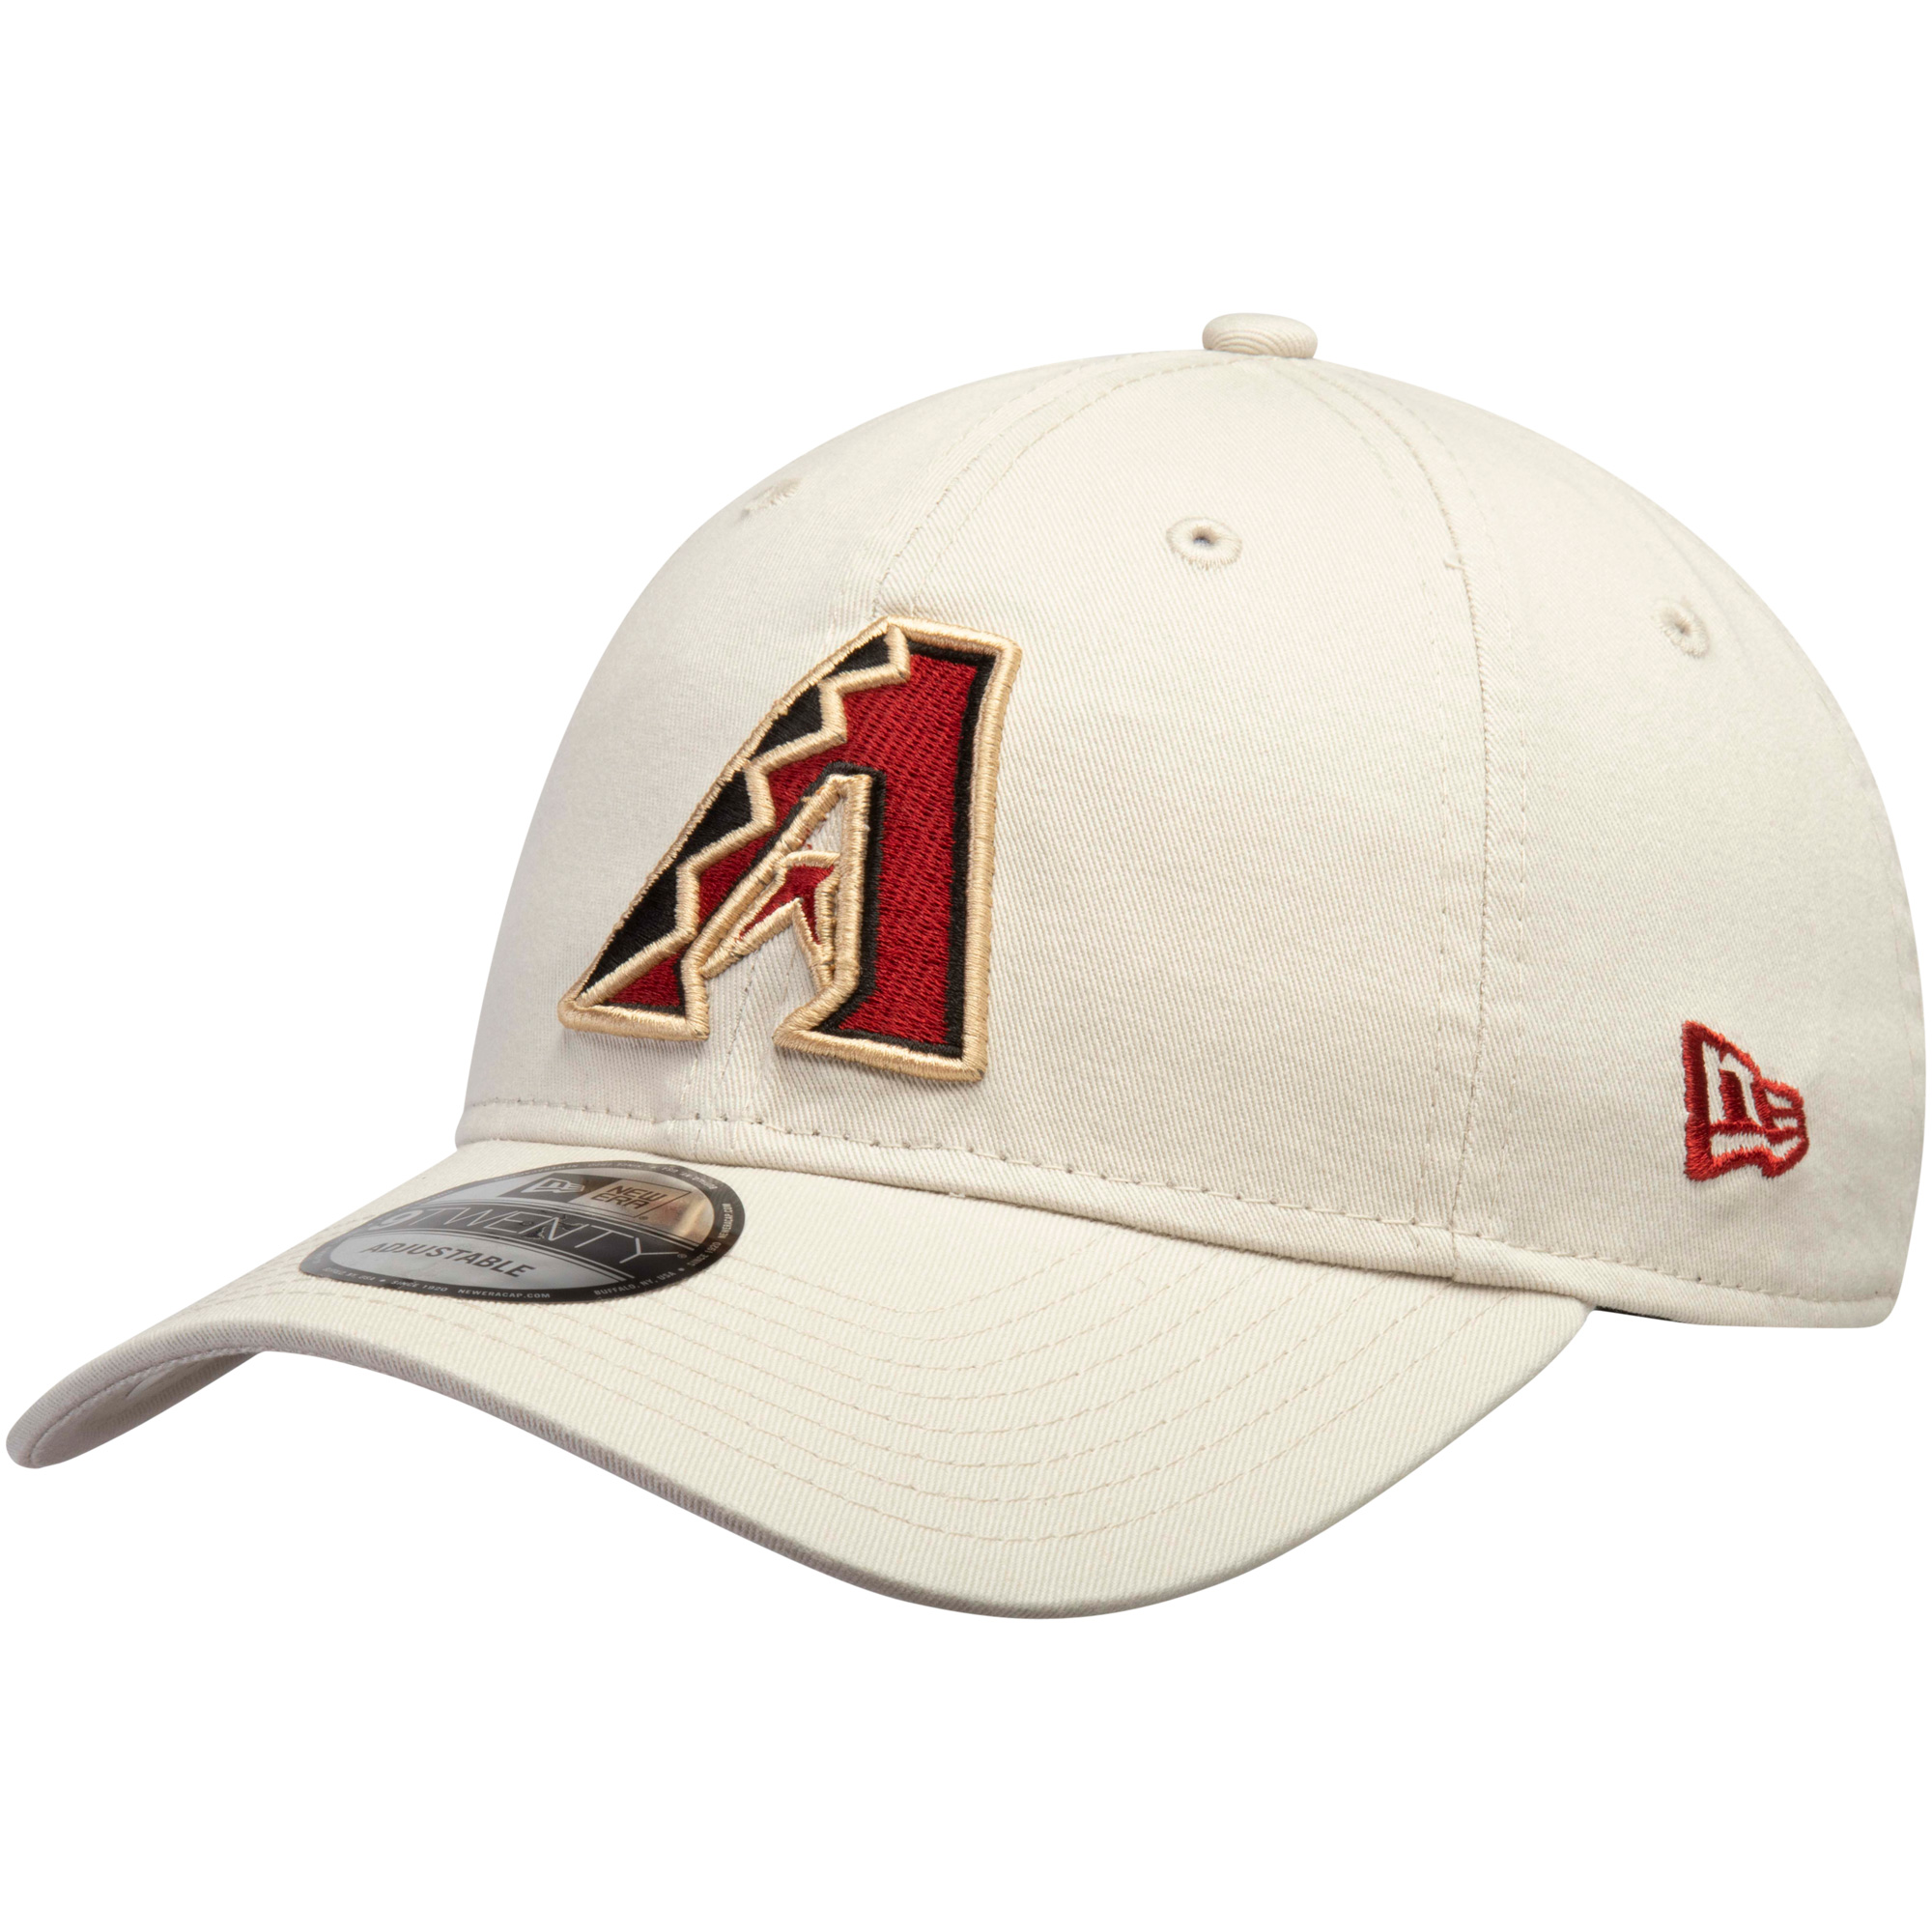 Arizona Diamondbacks New Era Core Classic Twill 9TWENTY Adjustable Hat - Tan - OSFA